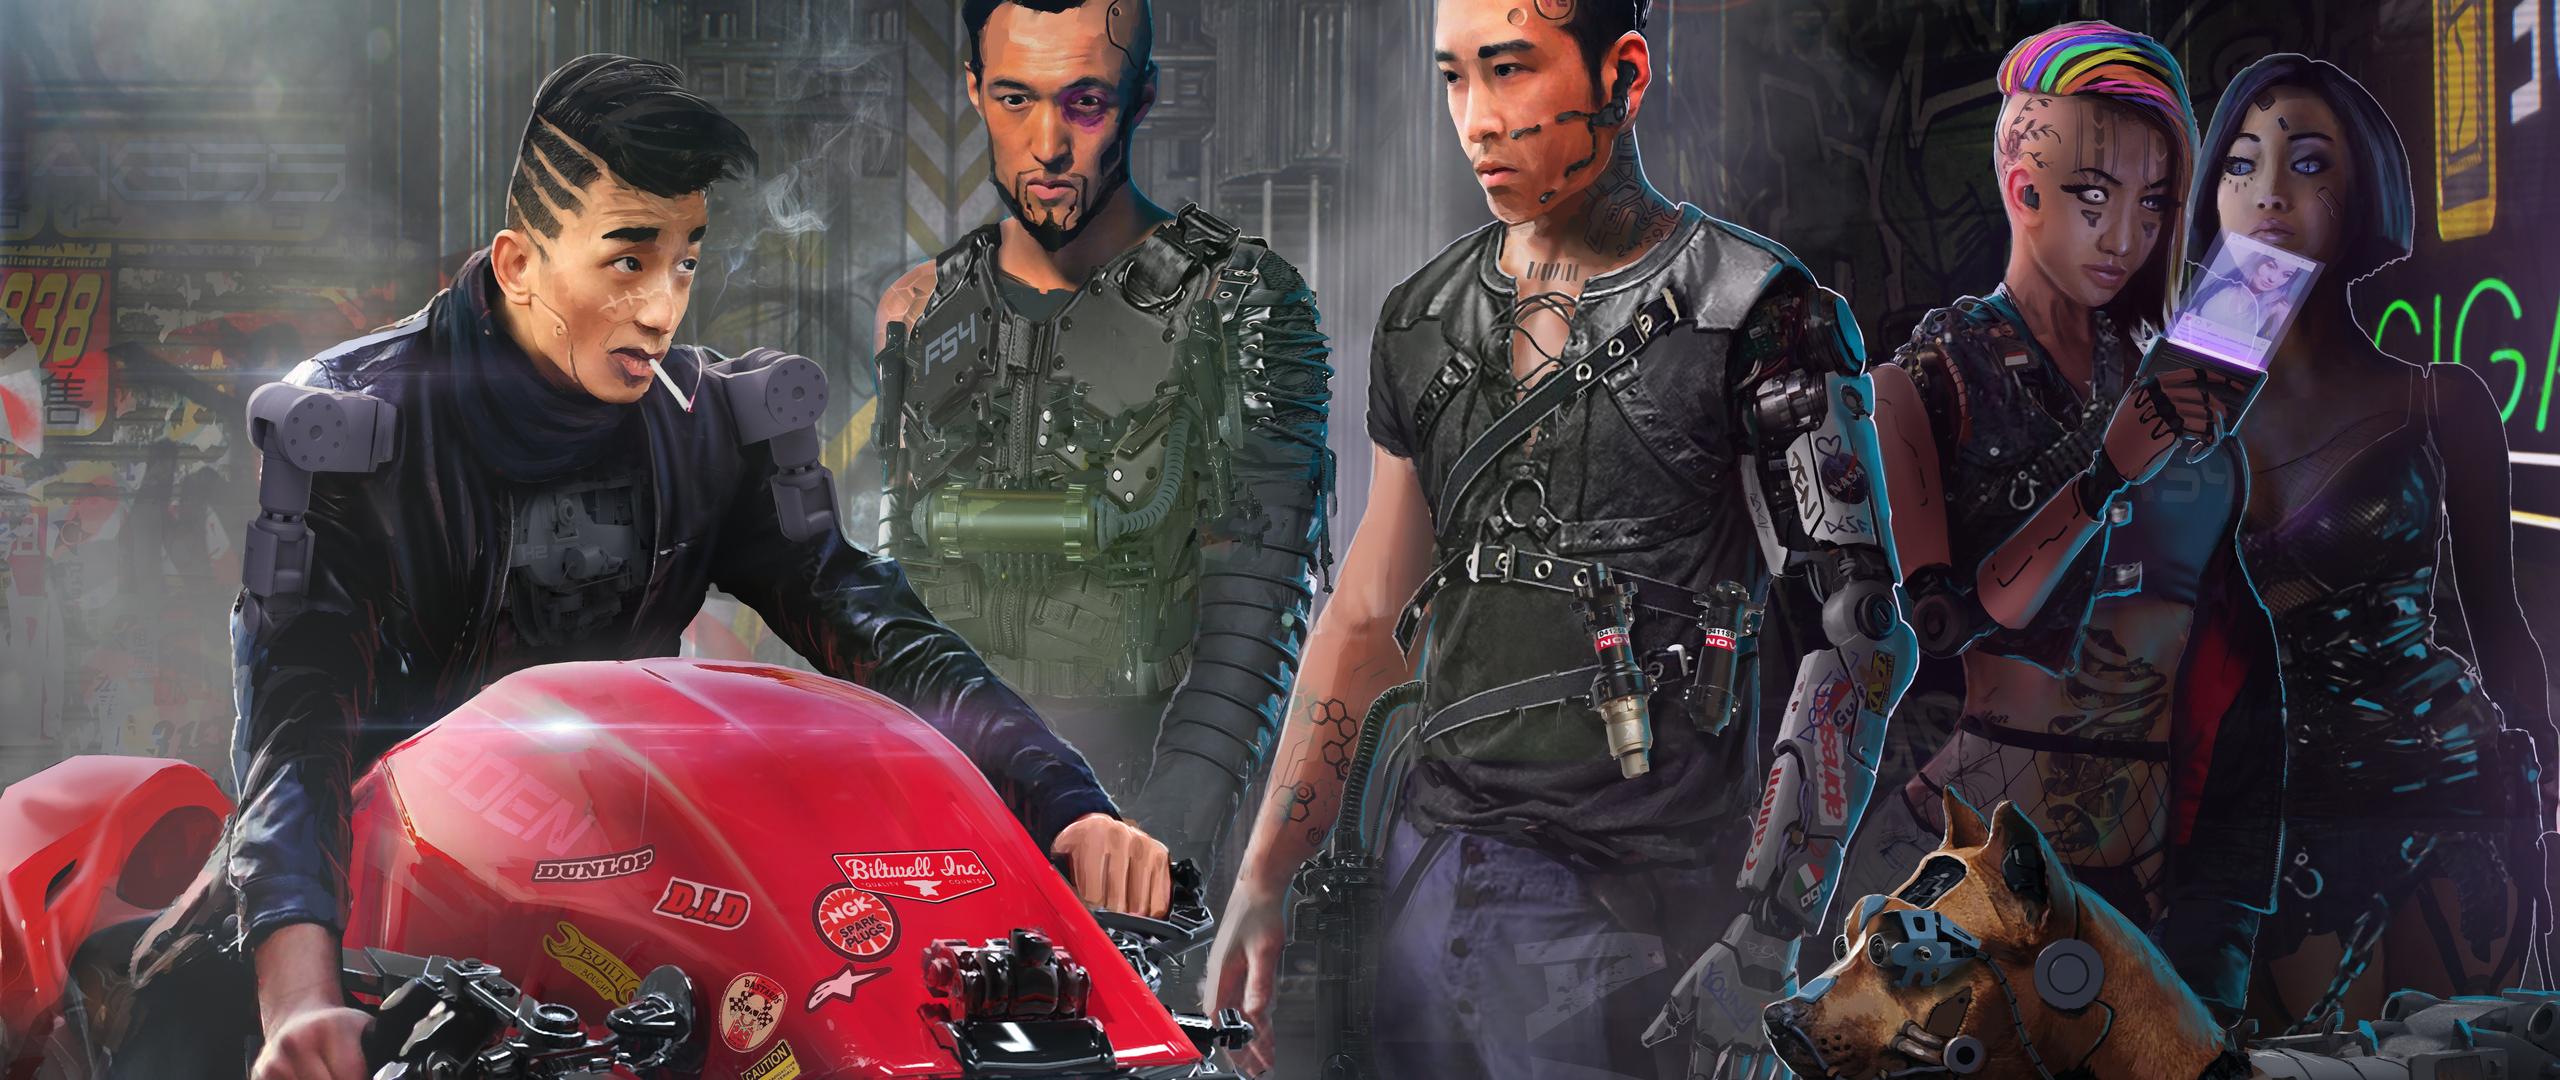 cyberpunk-cyborg-motorcycle-robot-robots-scifi-8k-rf.jpg